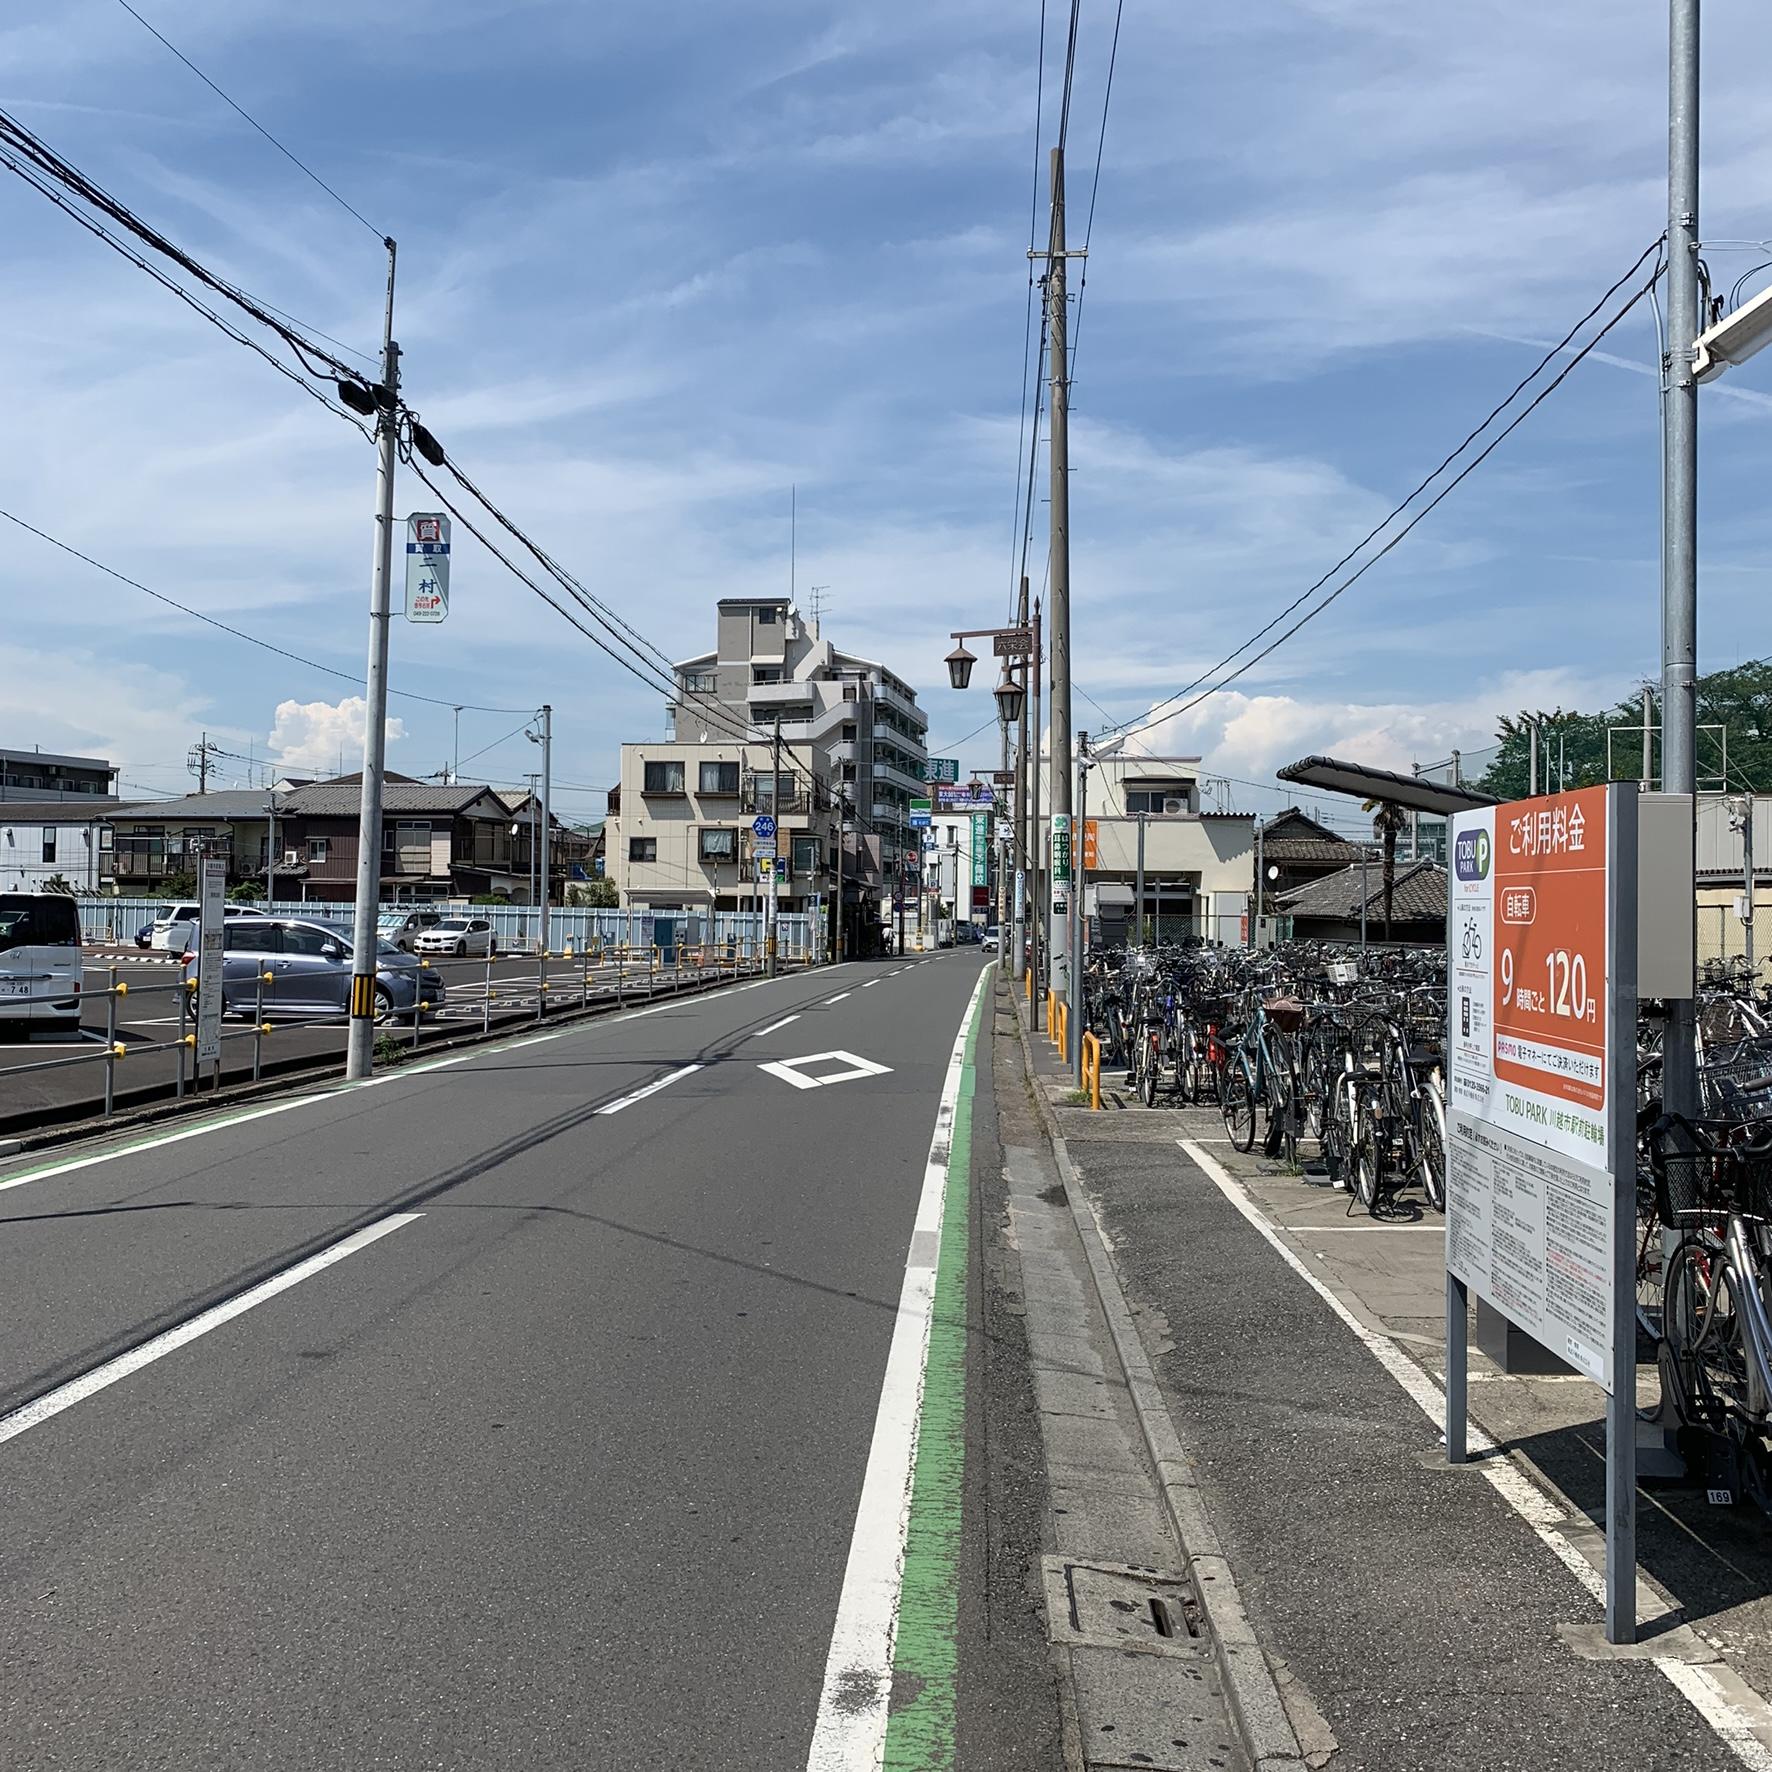 Come out of Kawagoe-shi station